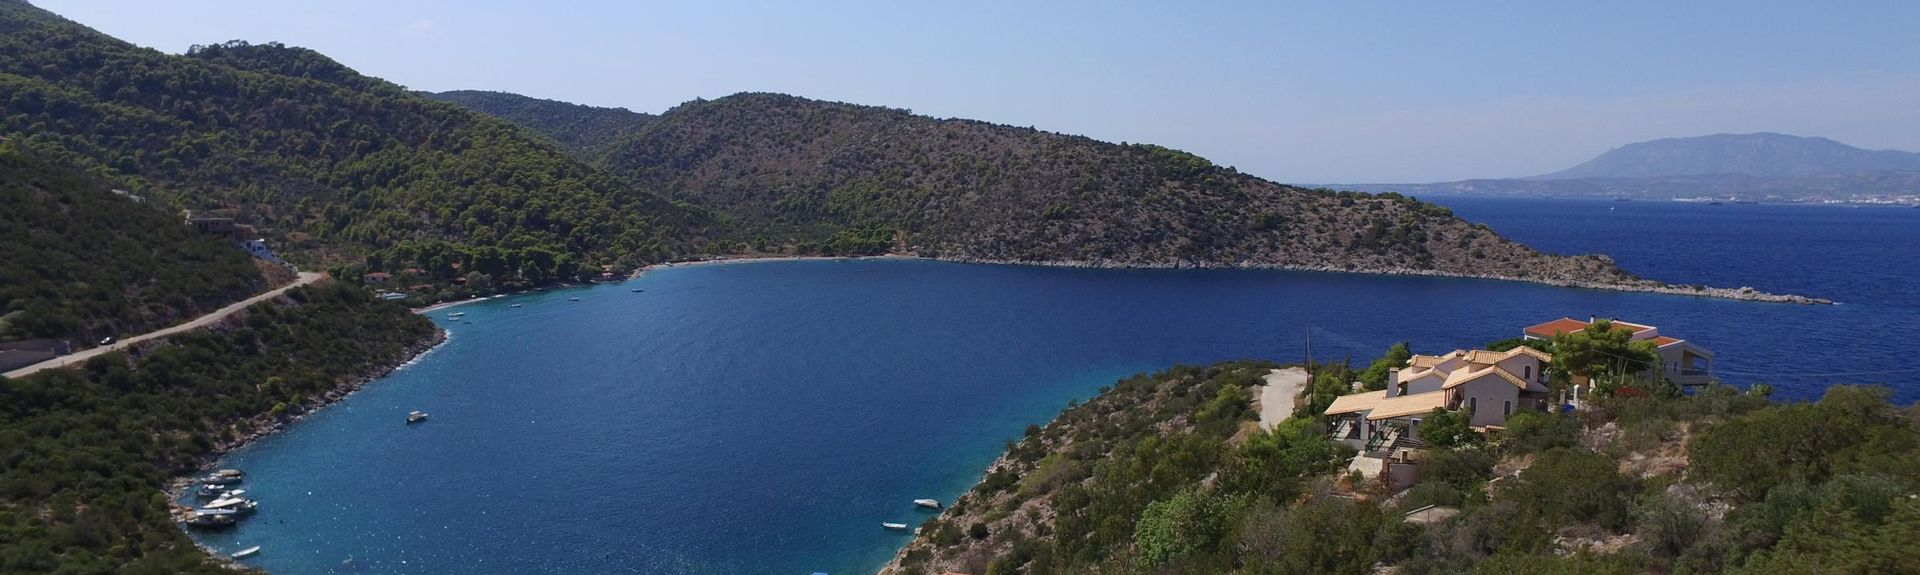 Kato Almiri, Peloponnesos, Griekenland